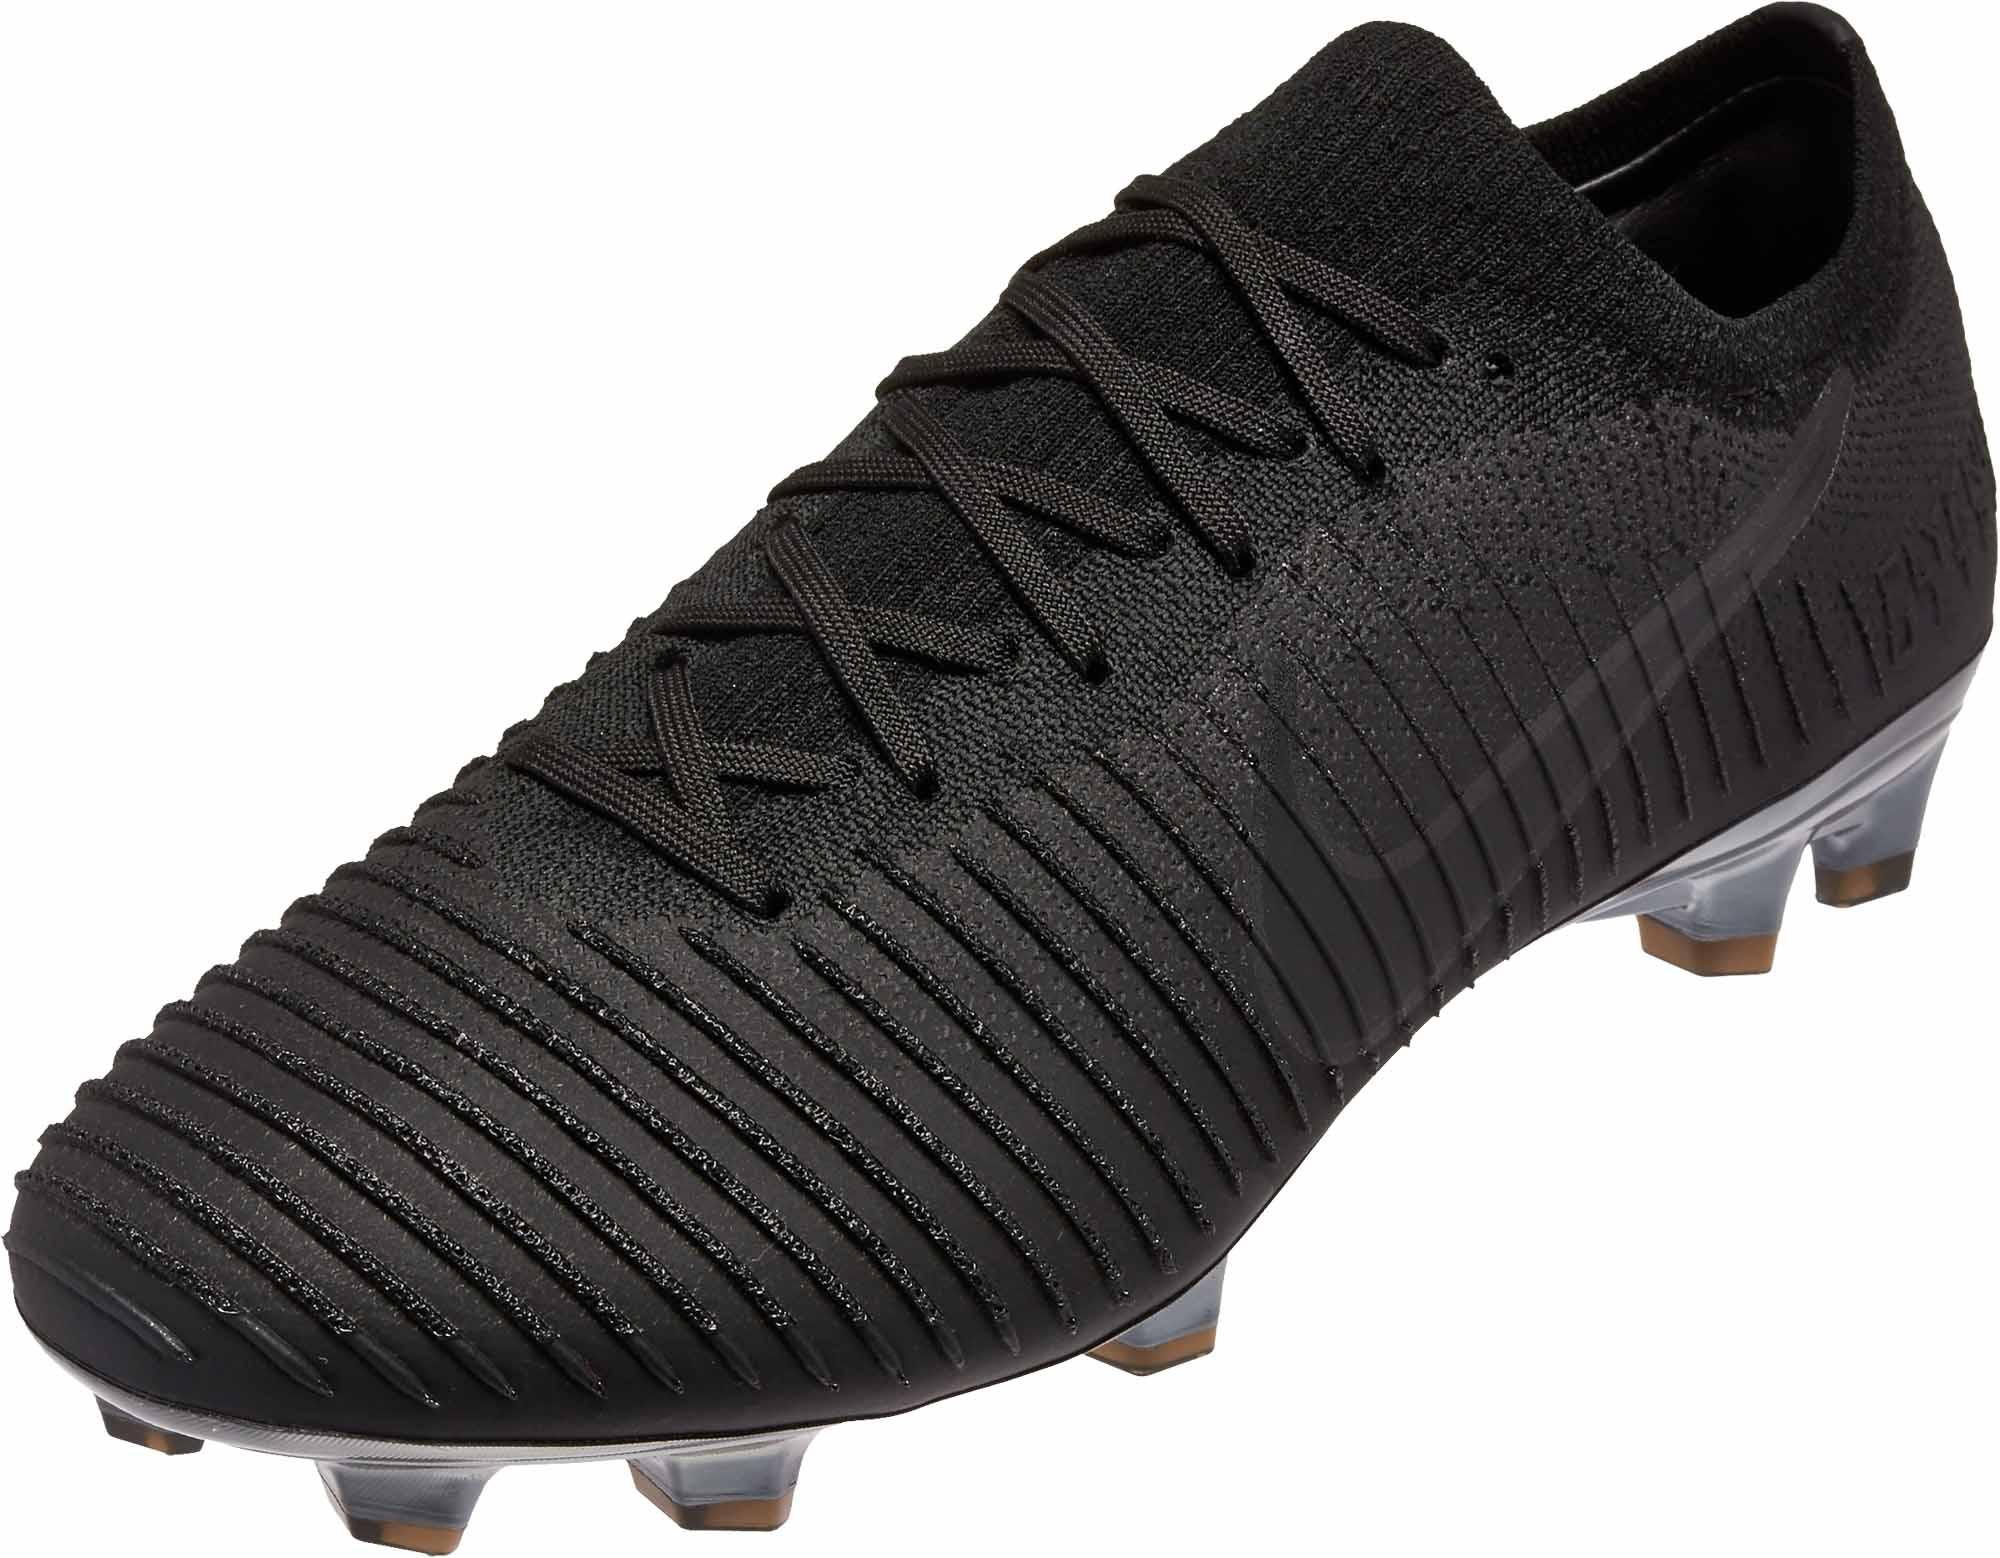 Nike Flyknit Ultra FG - Black - Soccer